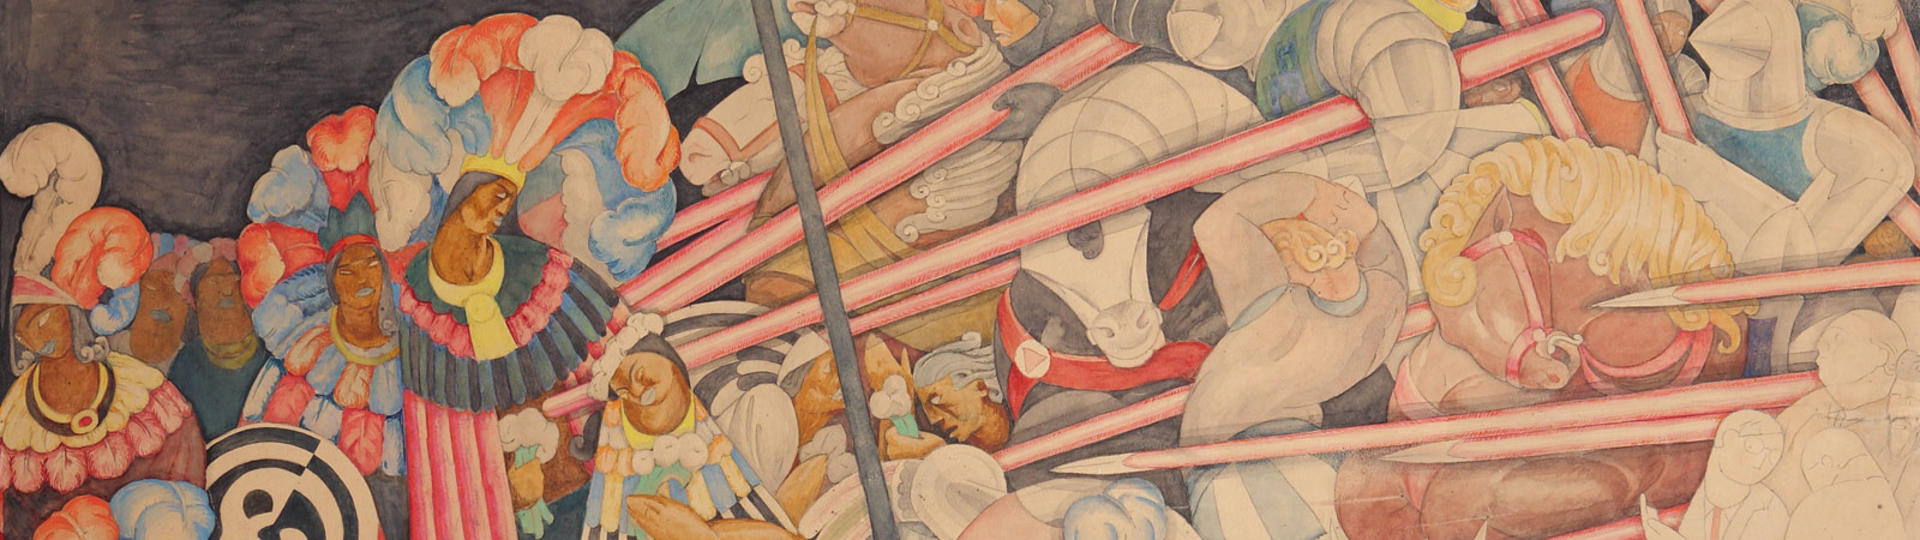 Jean Charlot, Massacre in the Main Temple